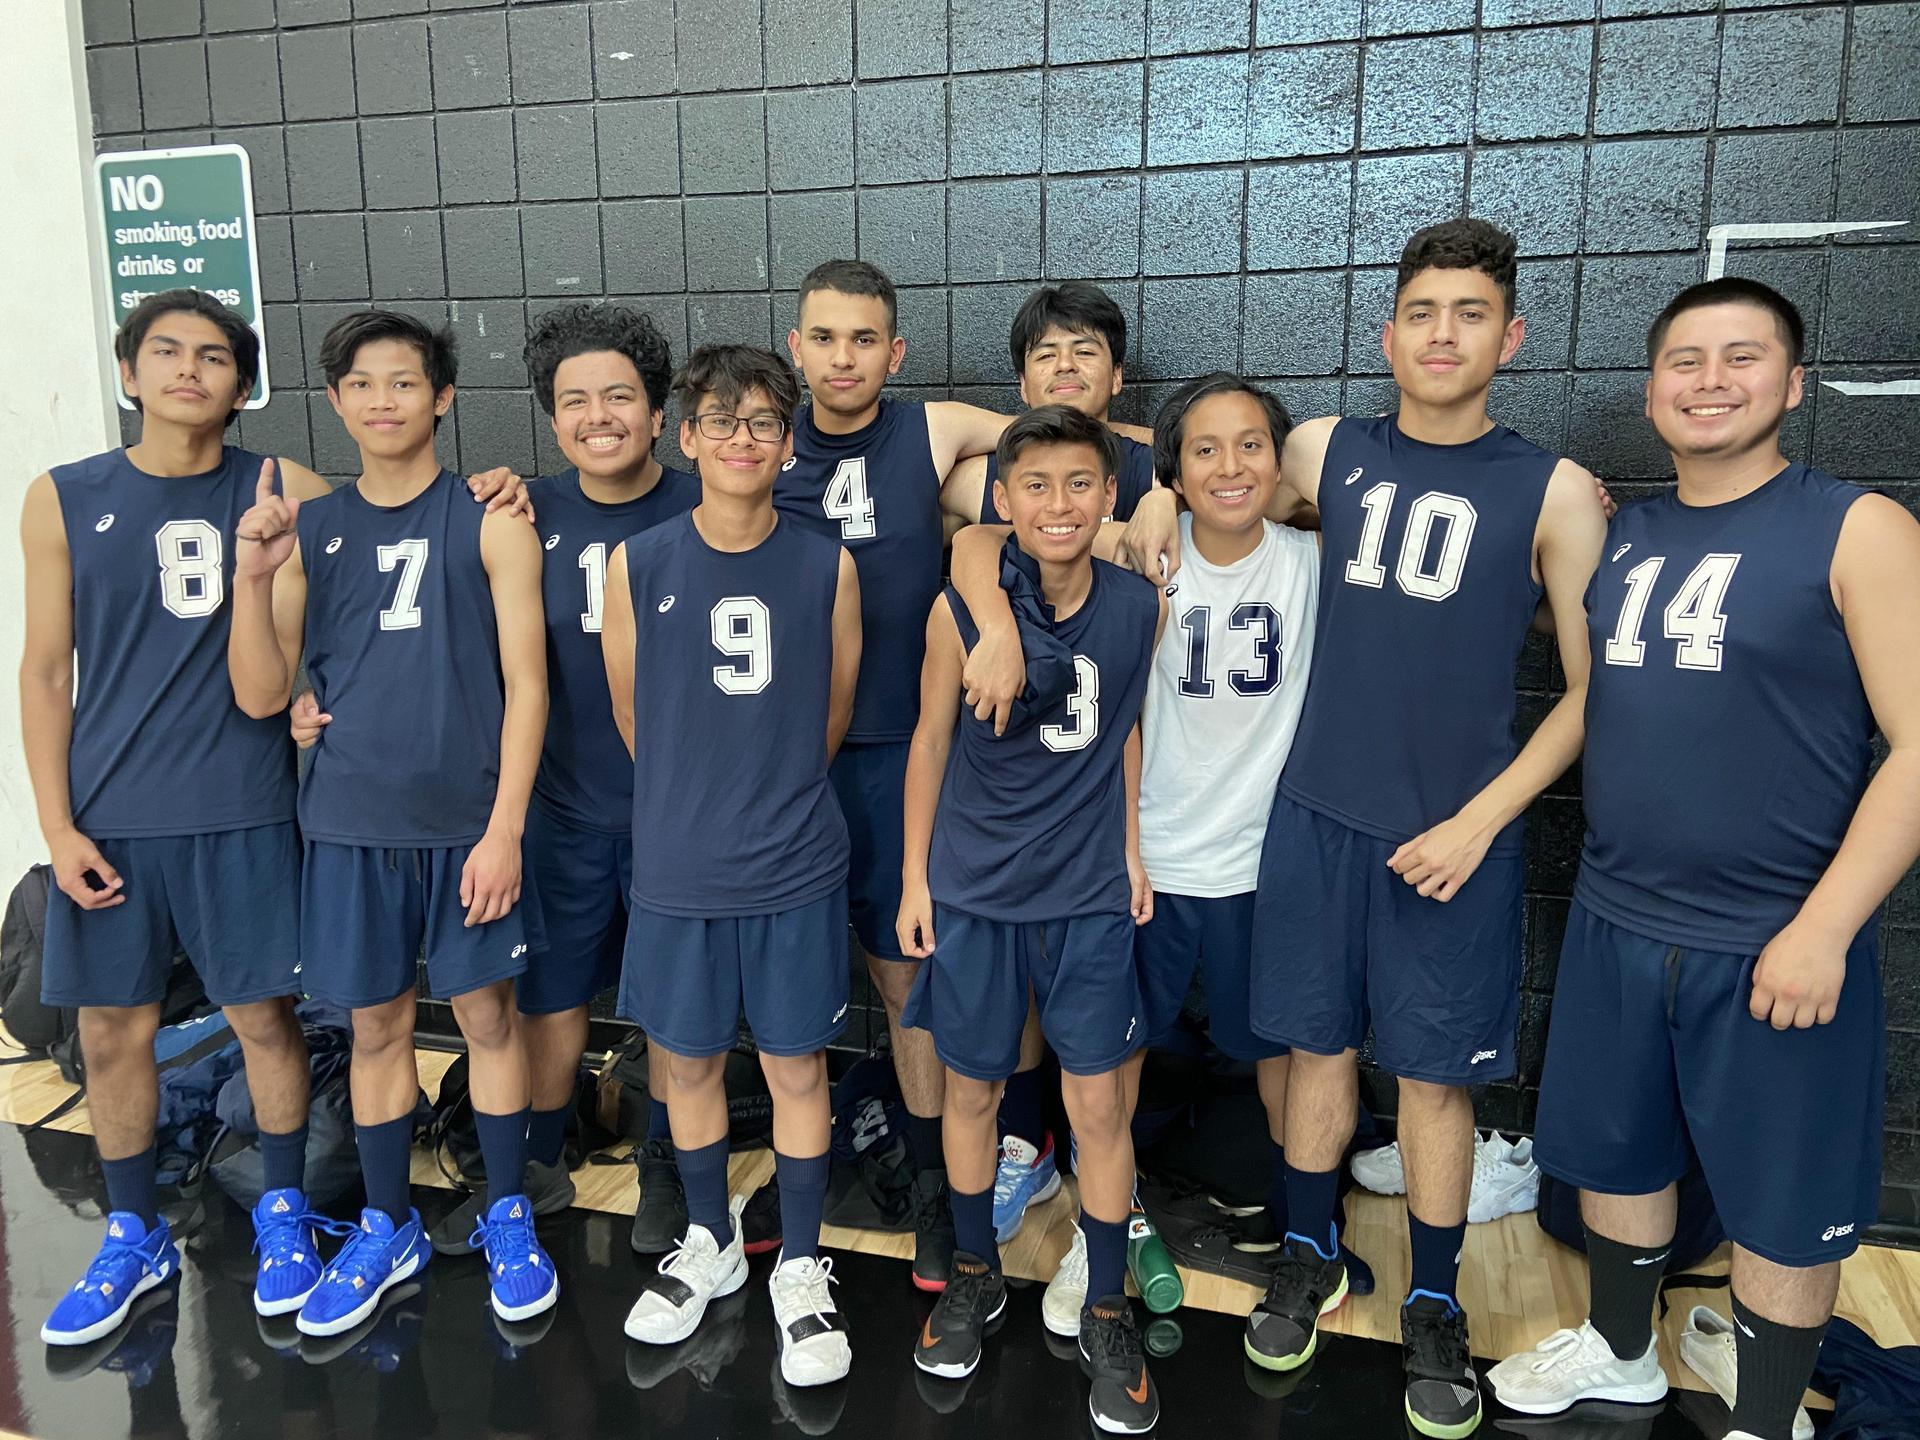 2019-2020 Boys Volleyball Team